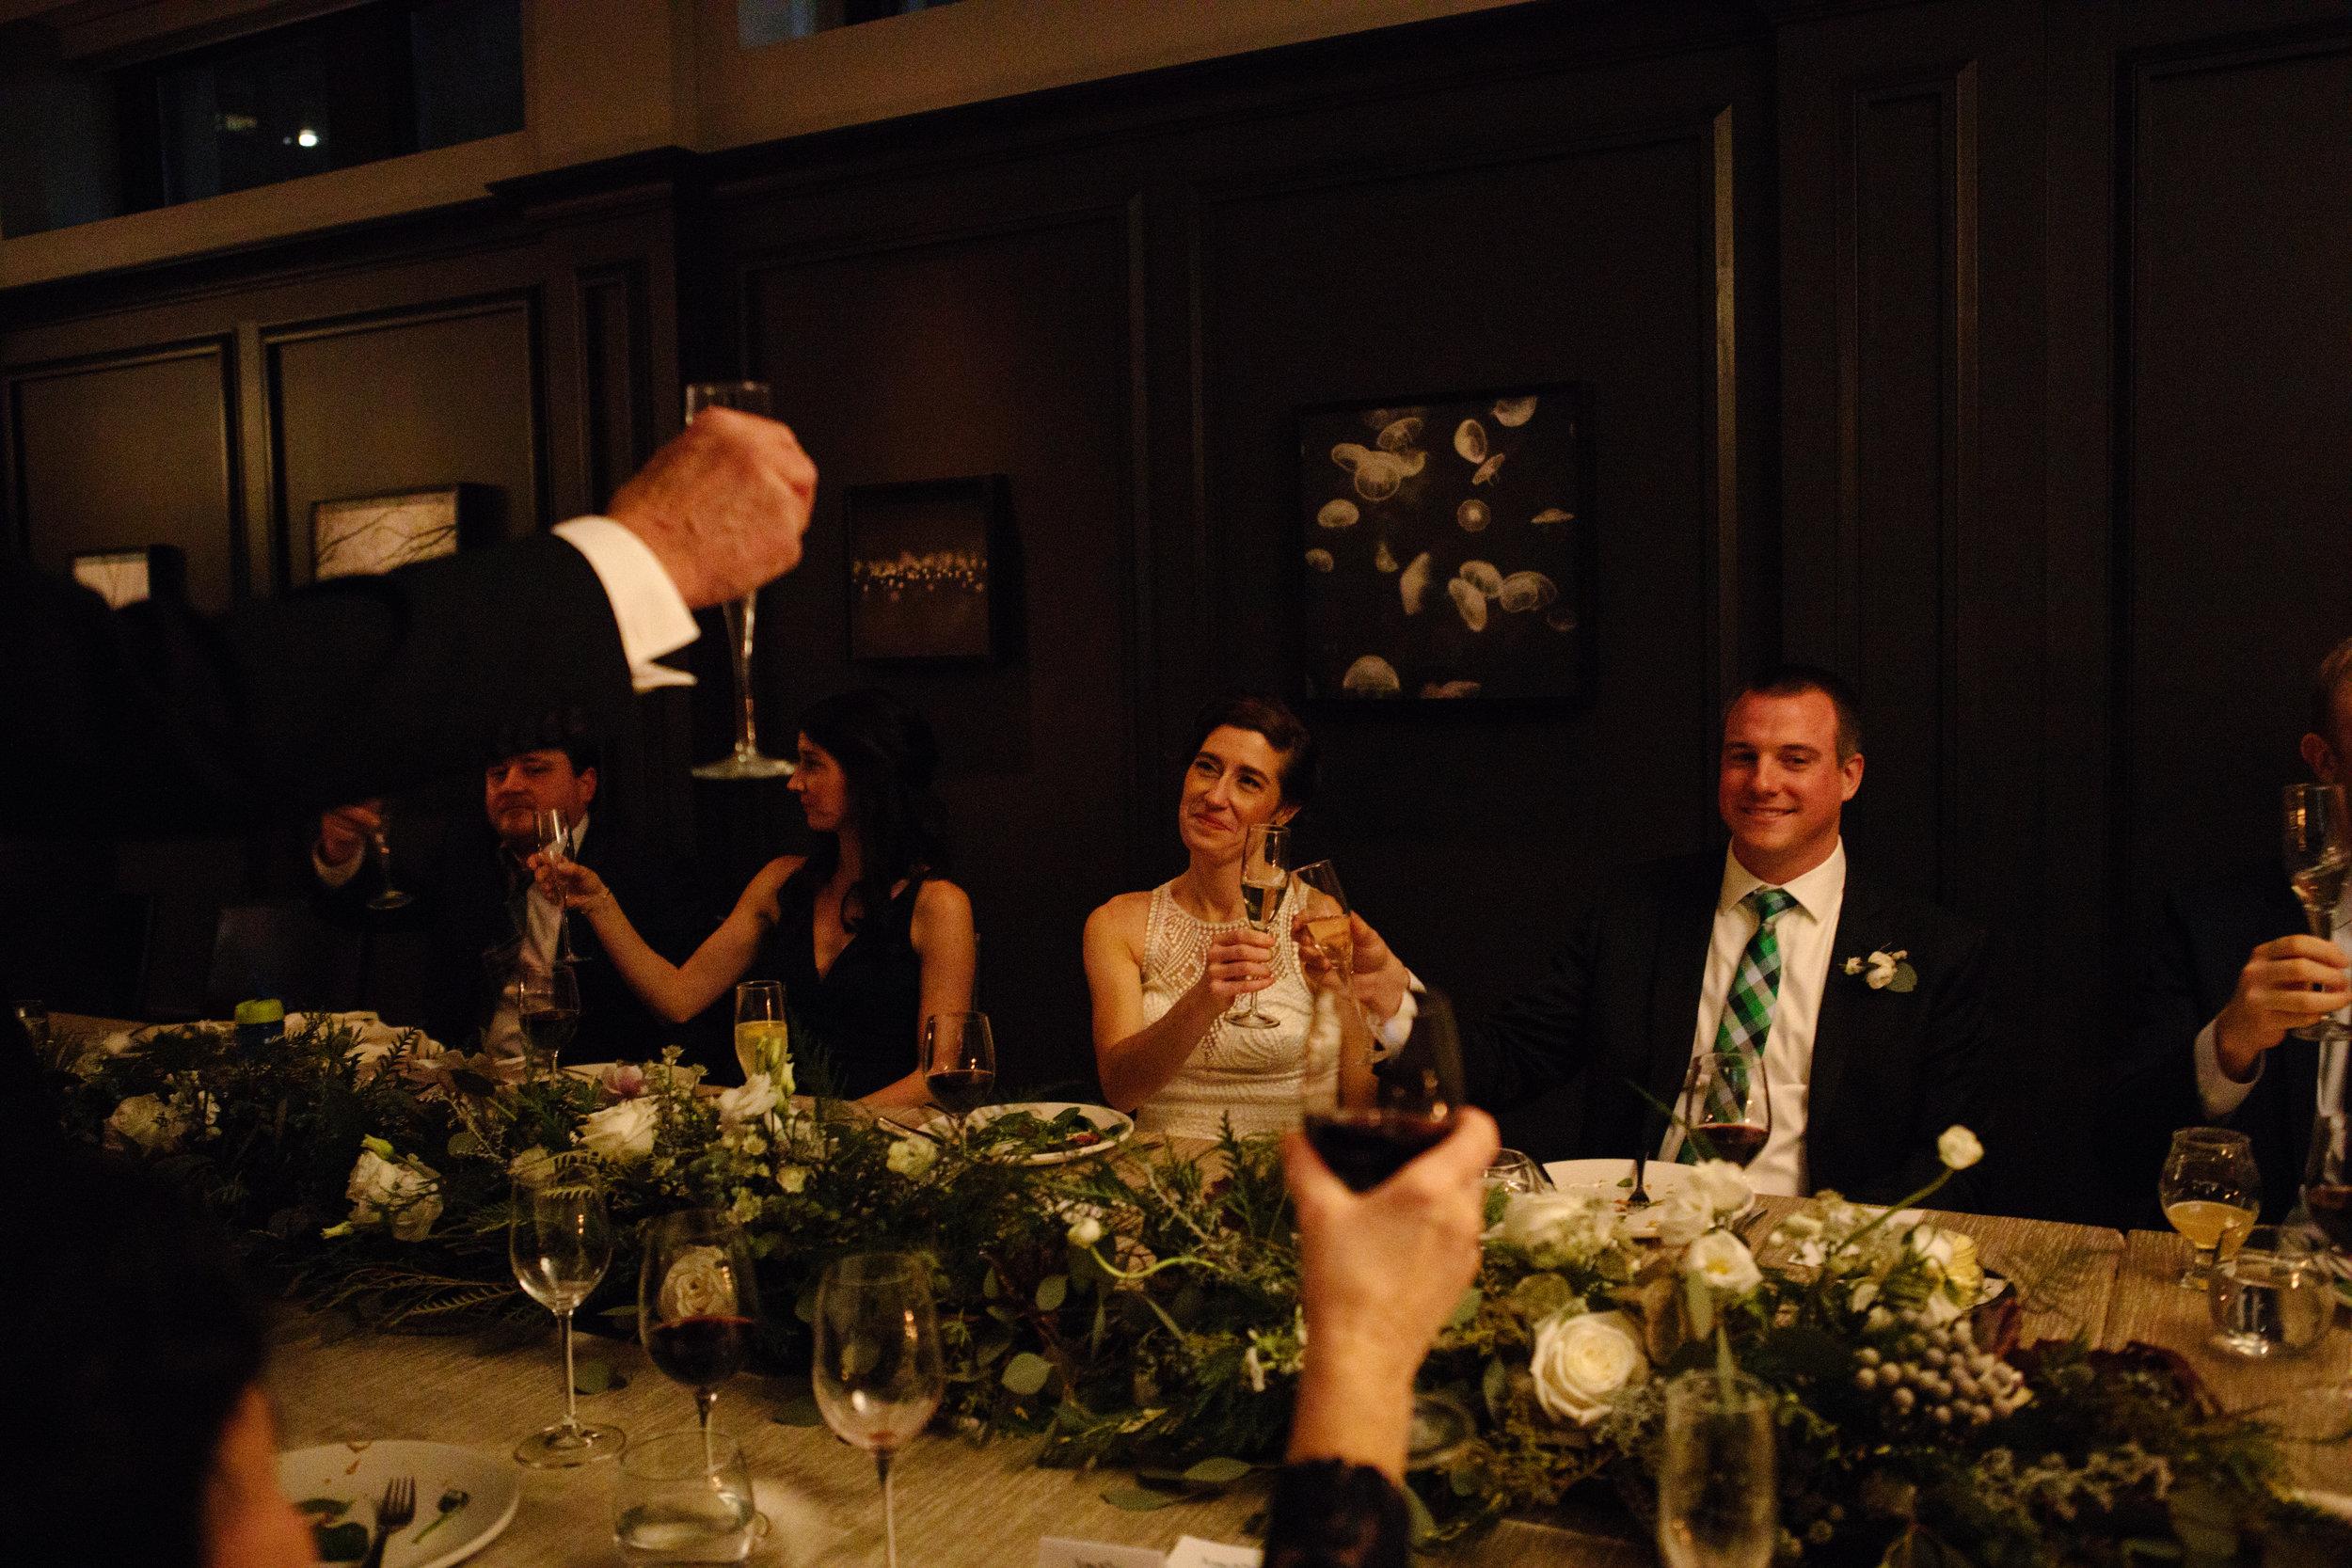 portland-maine-press-hotel-wedding-156.jpg